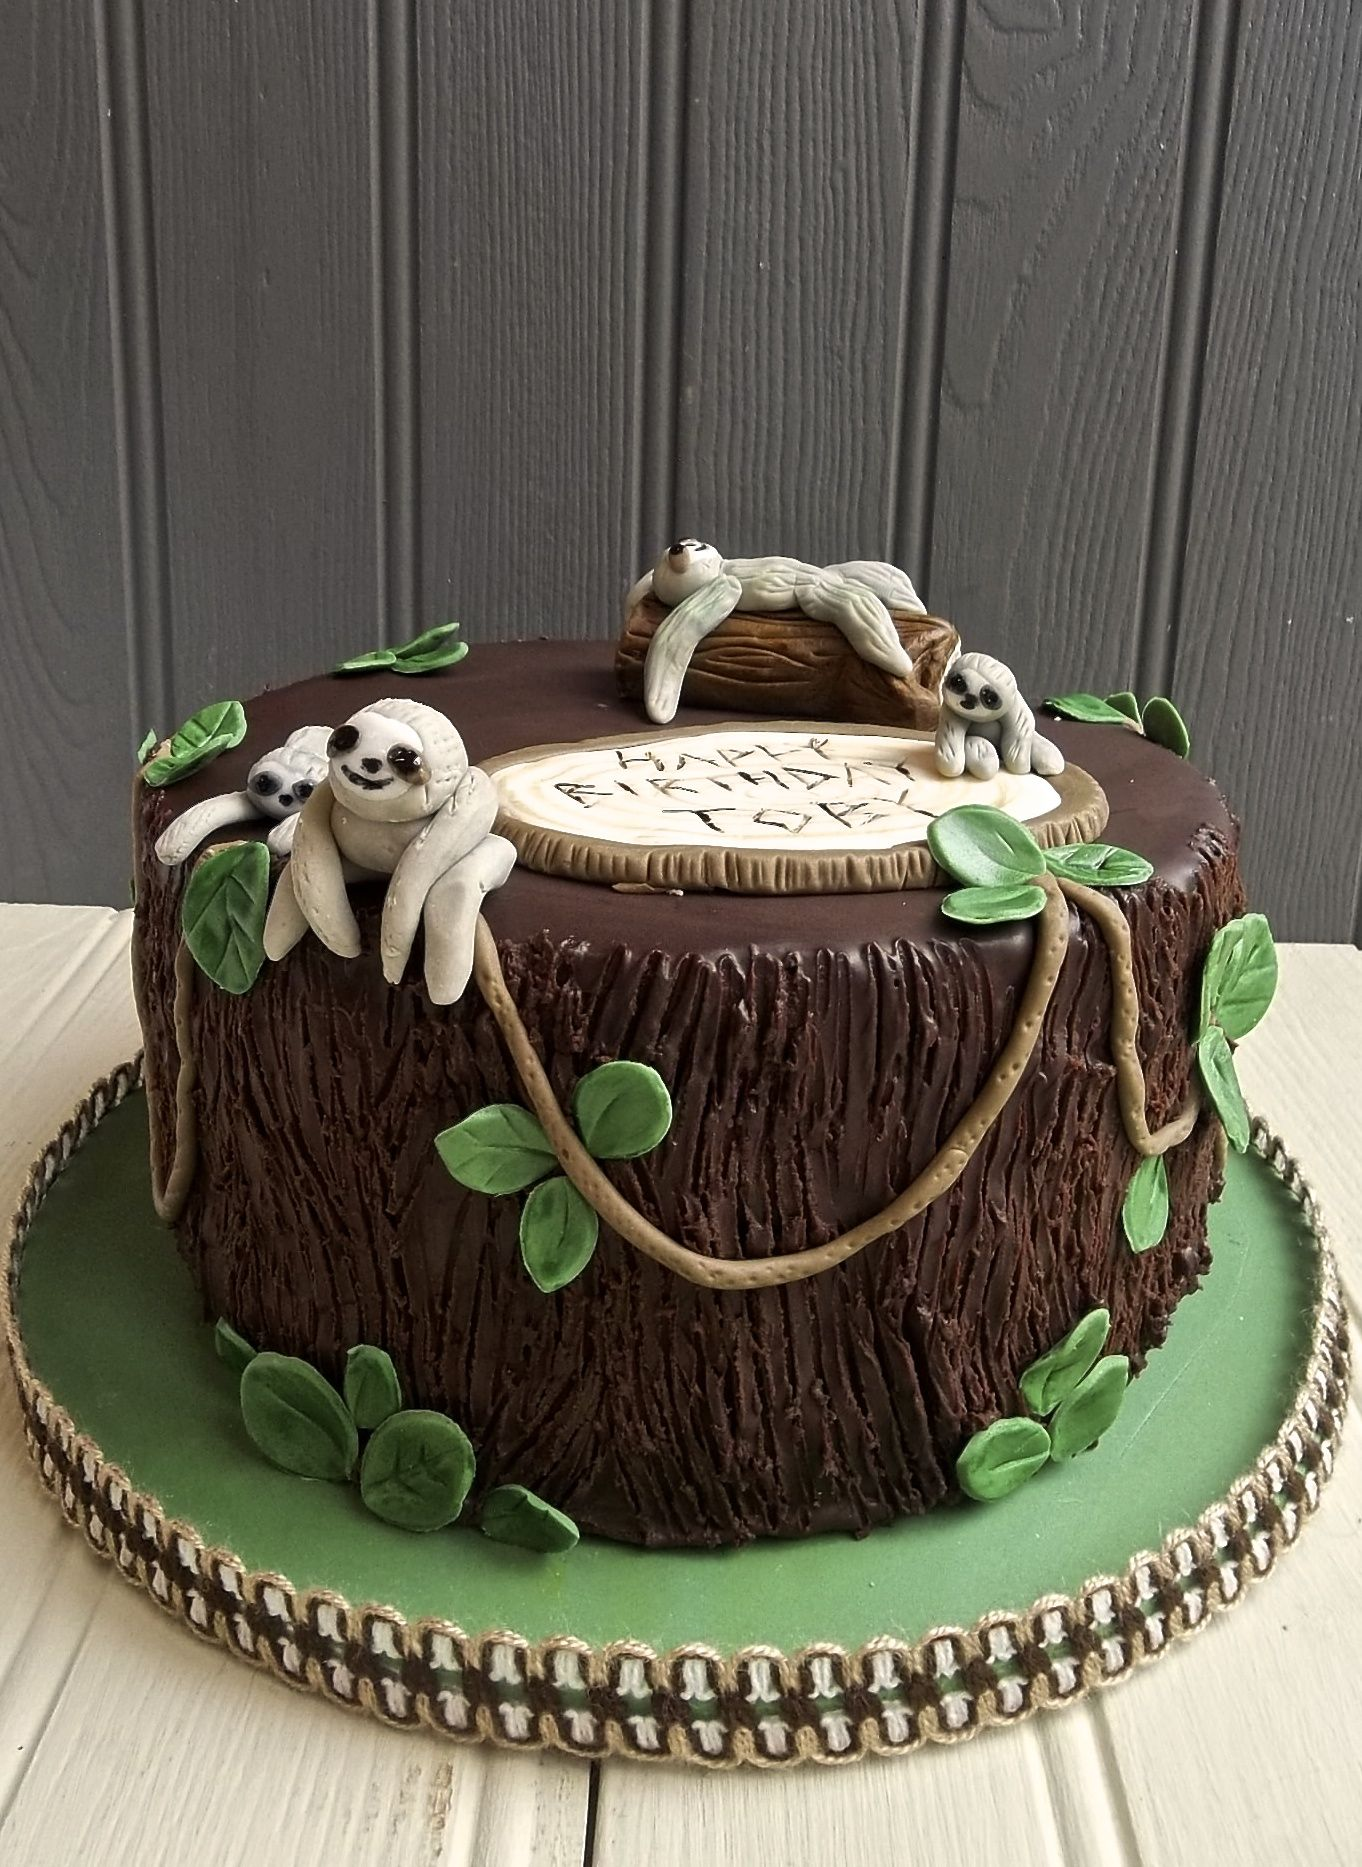 Sloth Cake. Eat My Cake London | Fooooooood<3 in 2019 | Cupcake ...